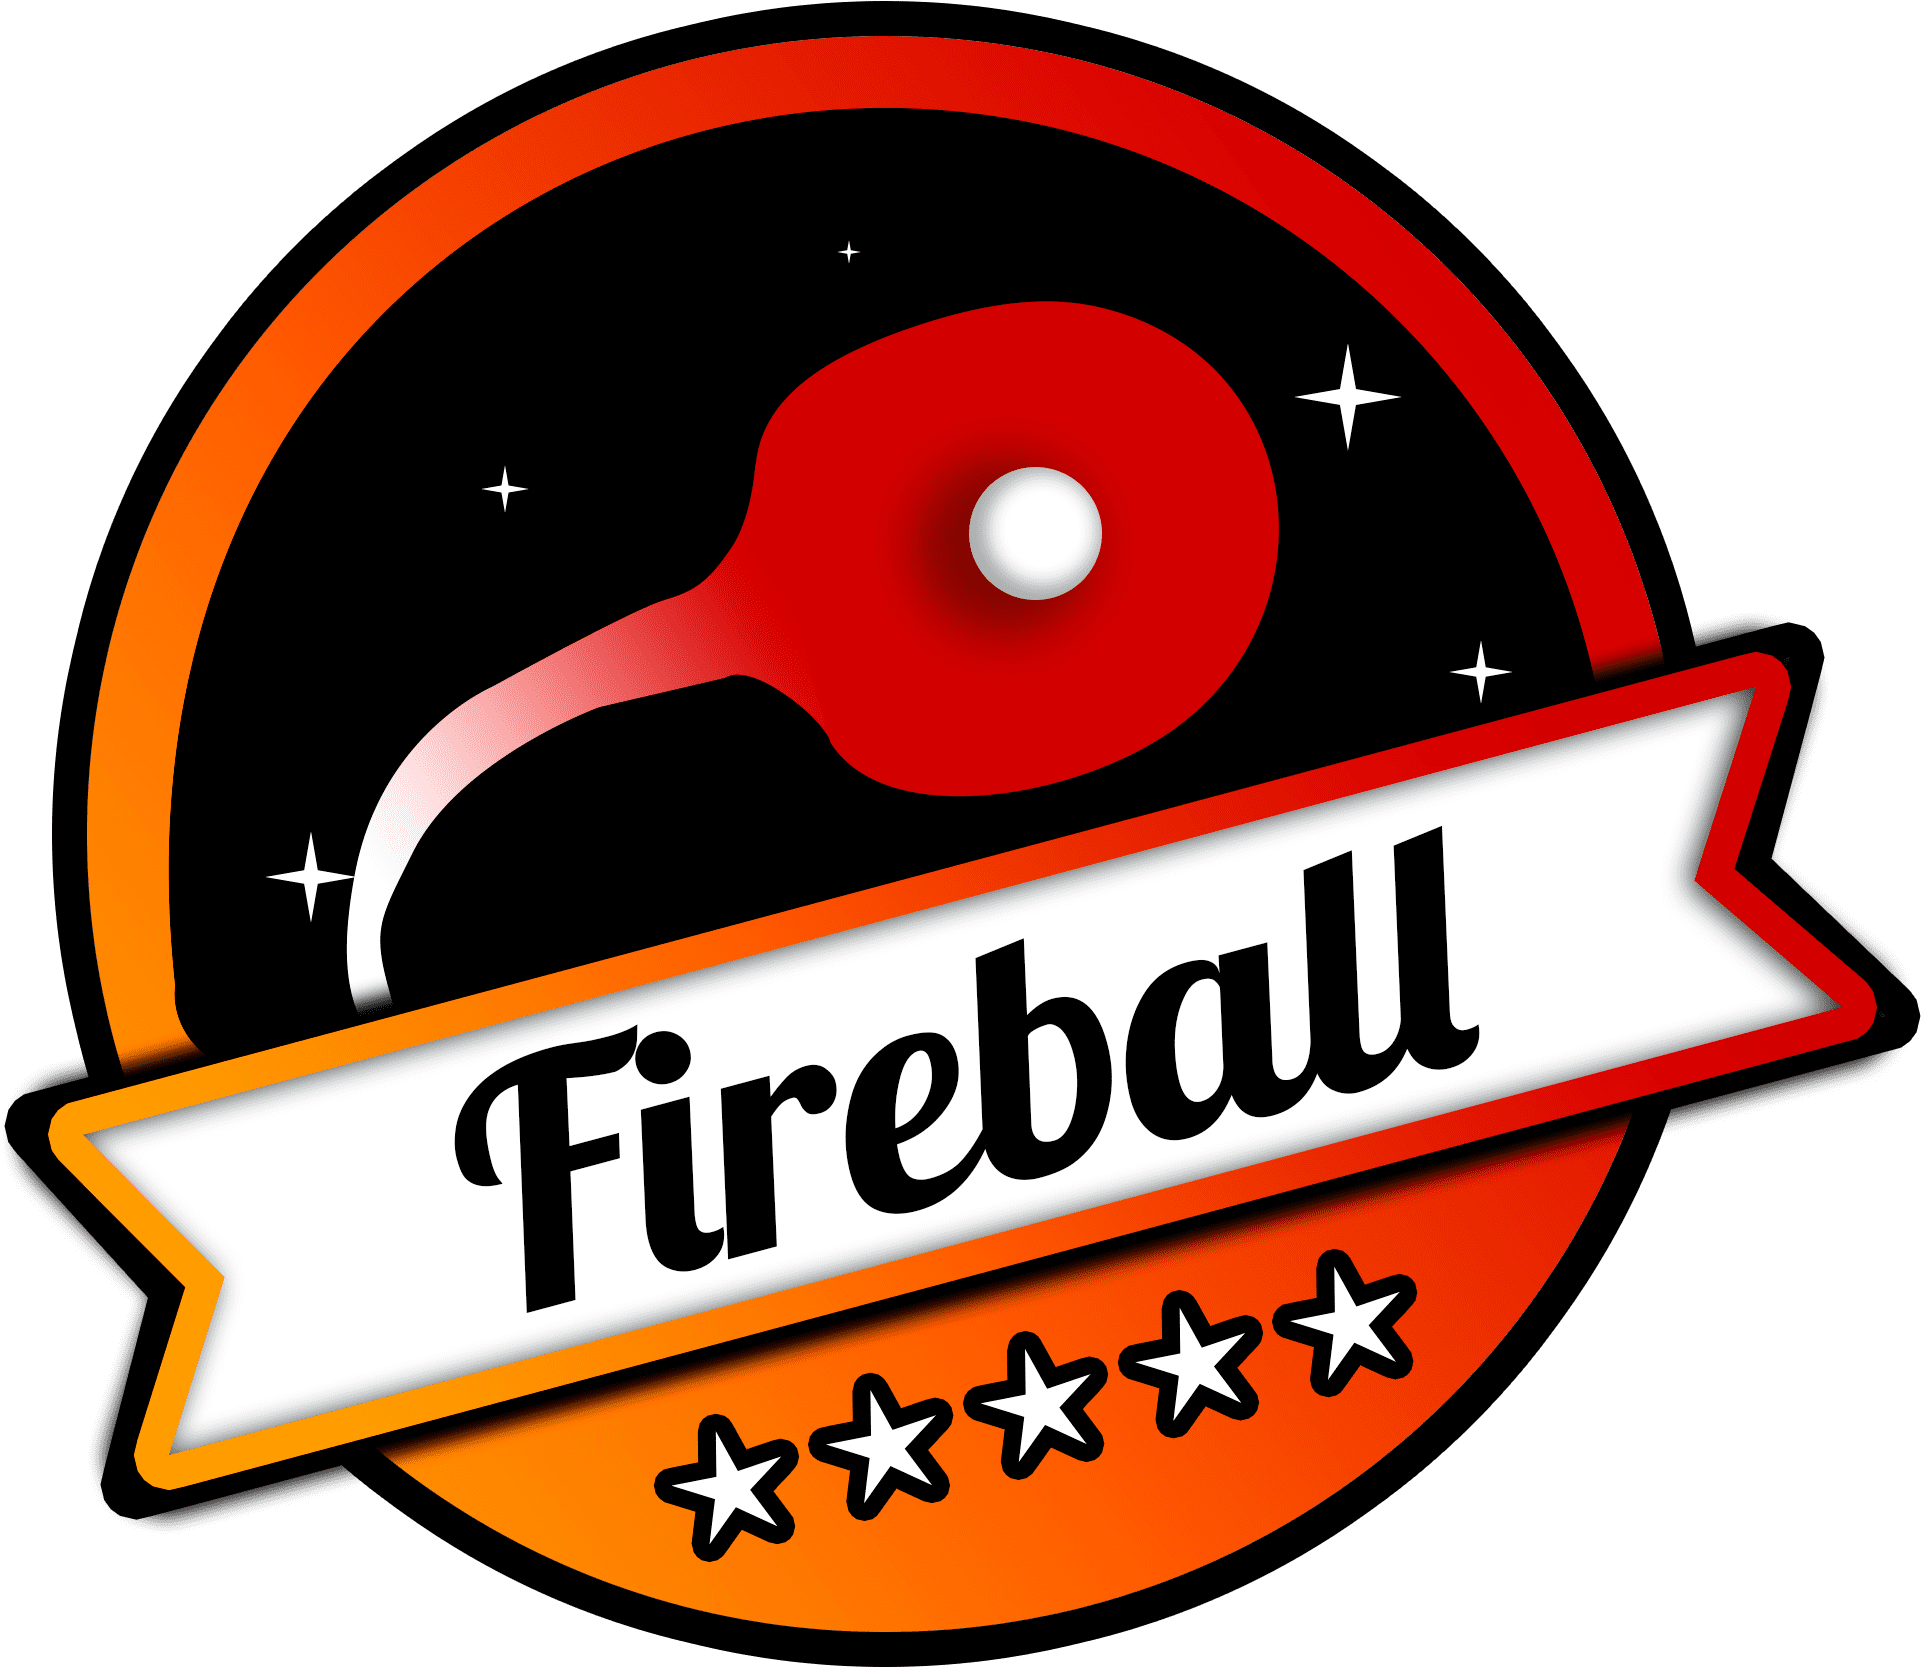 Fireball logo (Ping pong club logo)